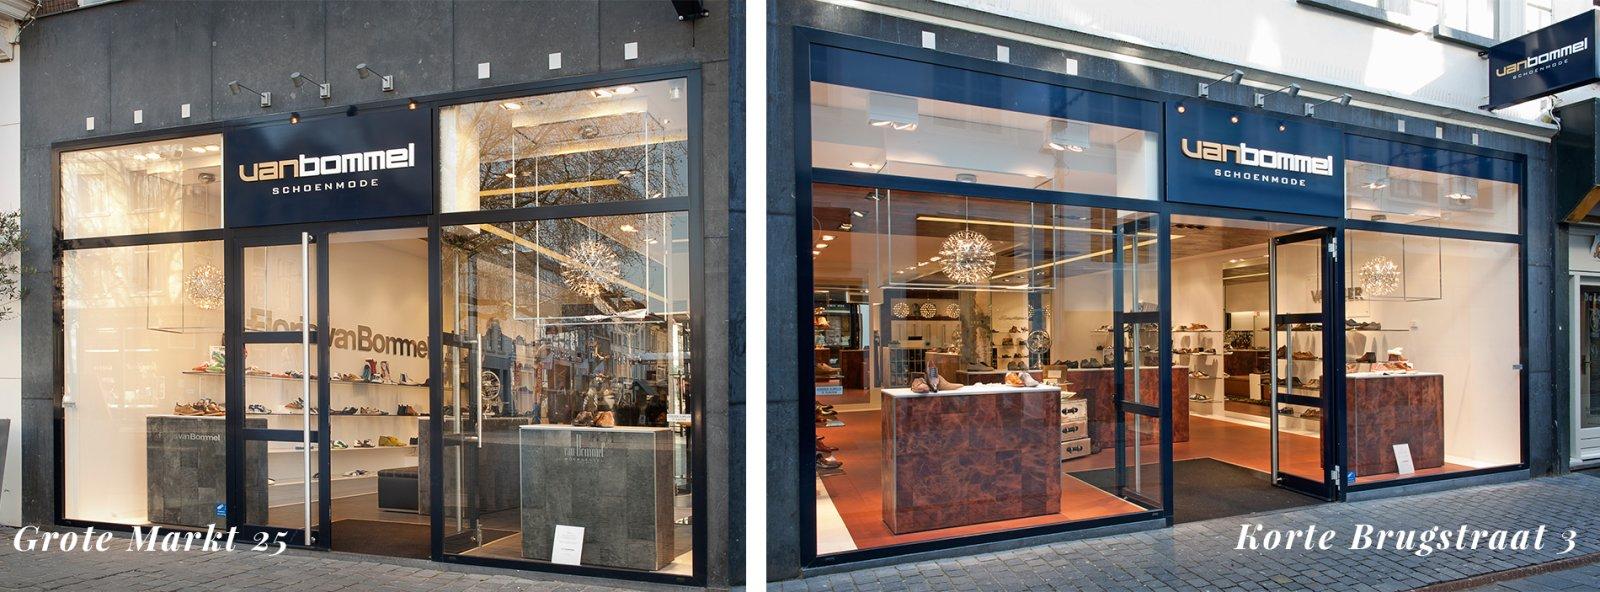 Schoenen Herenwinkel Breda Van Bommel Shoppen Stappenamp; UpzSqMV